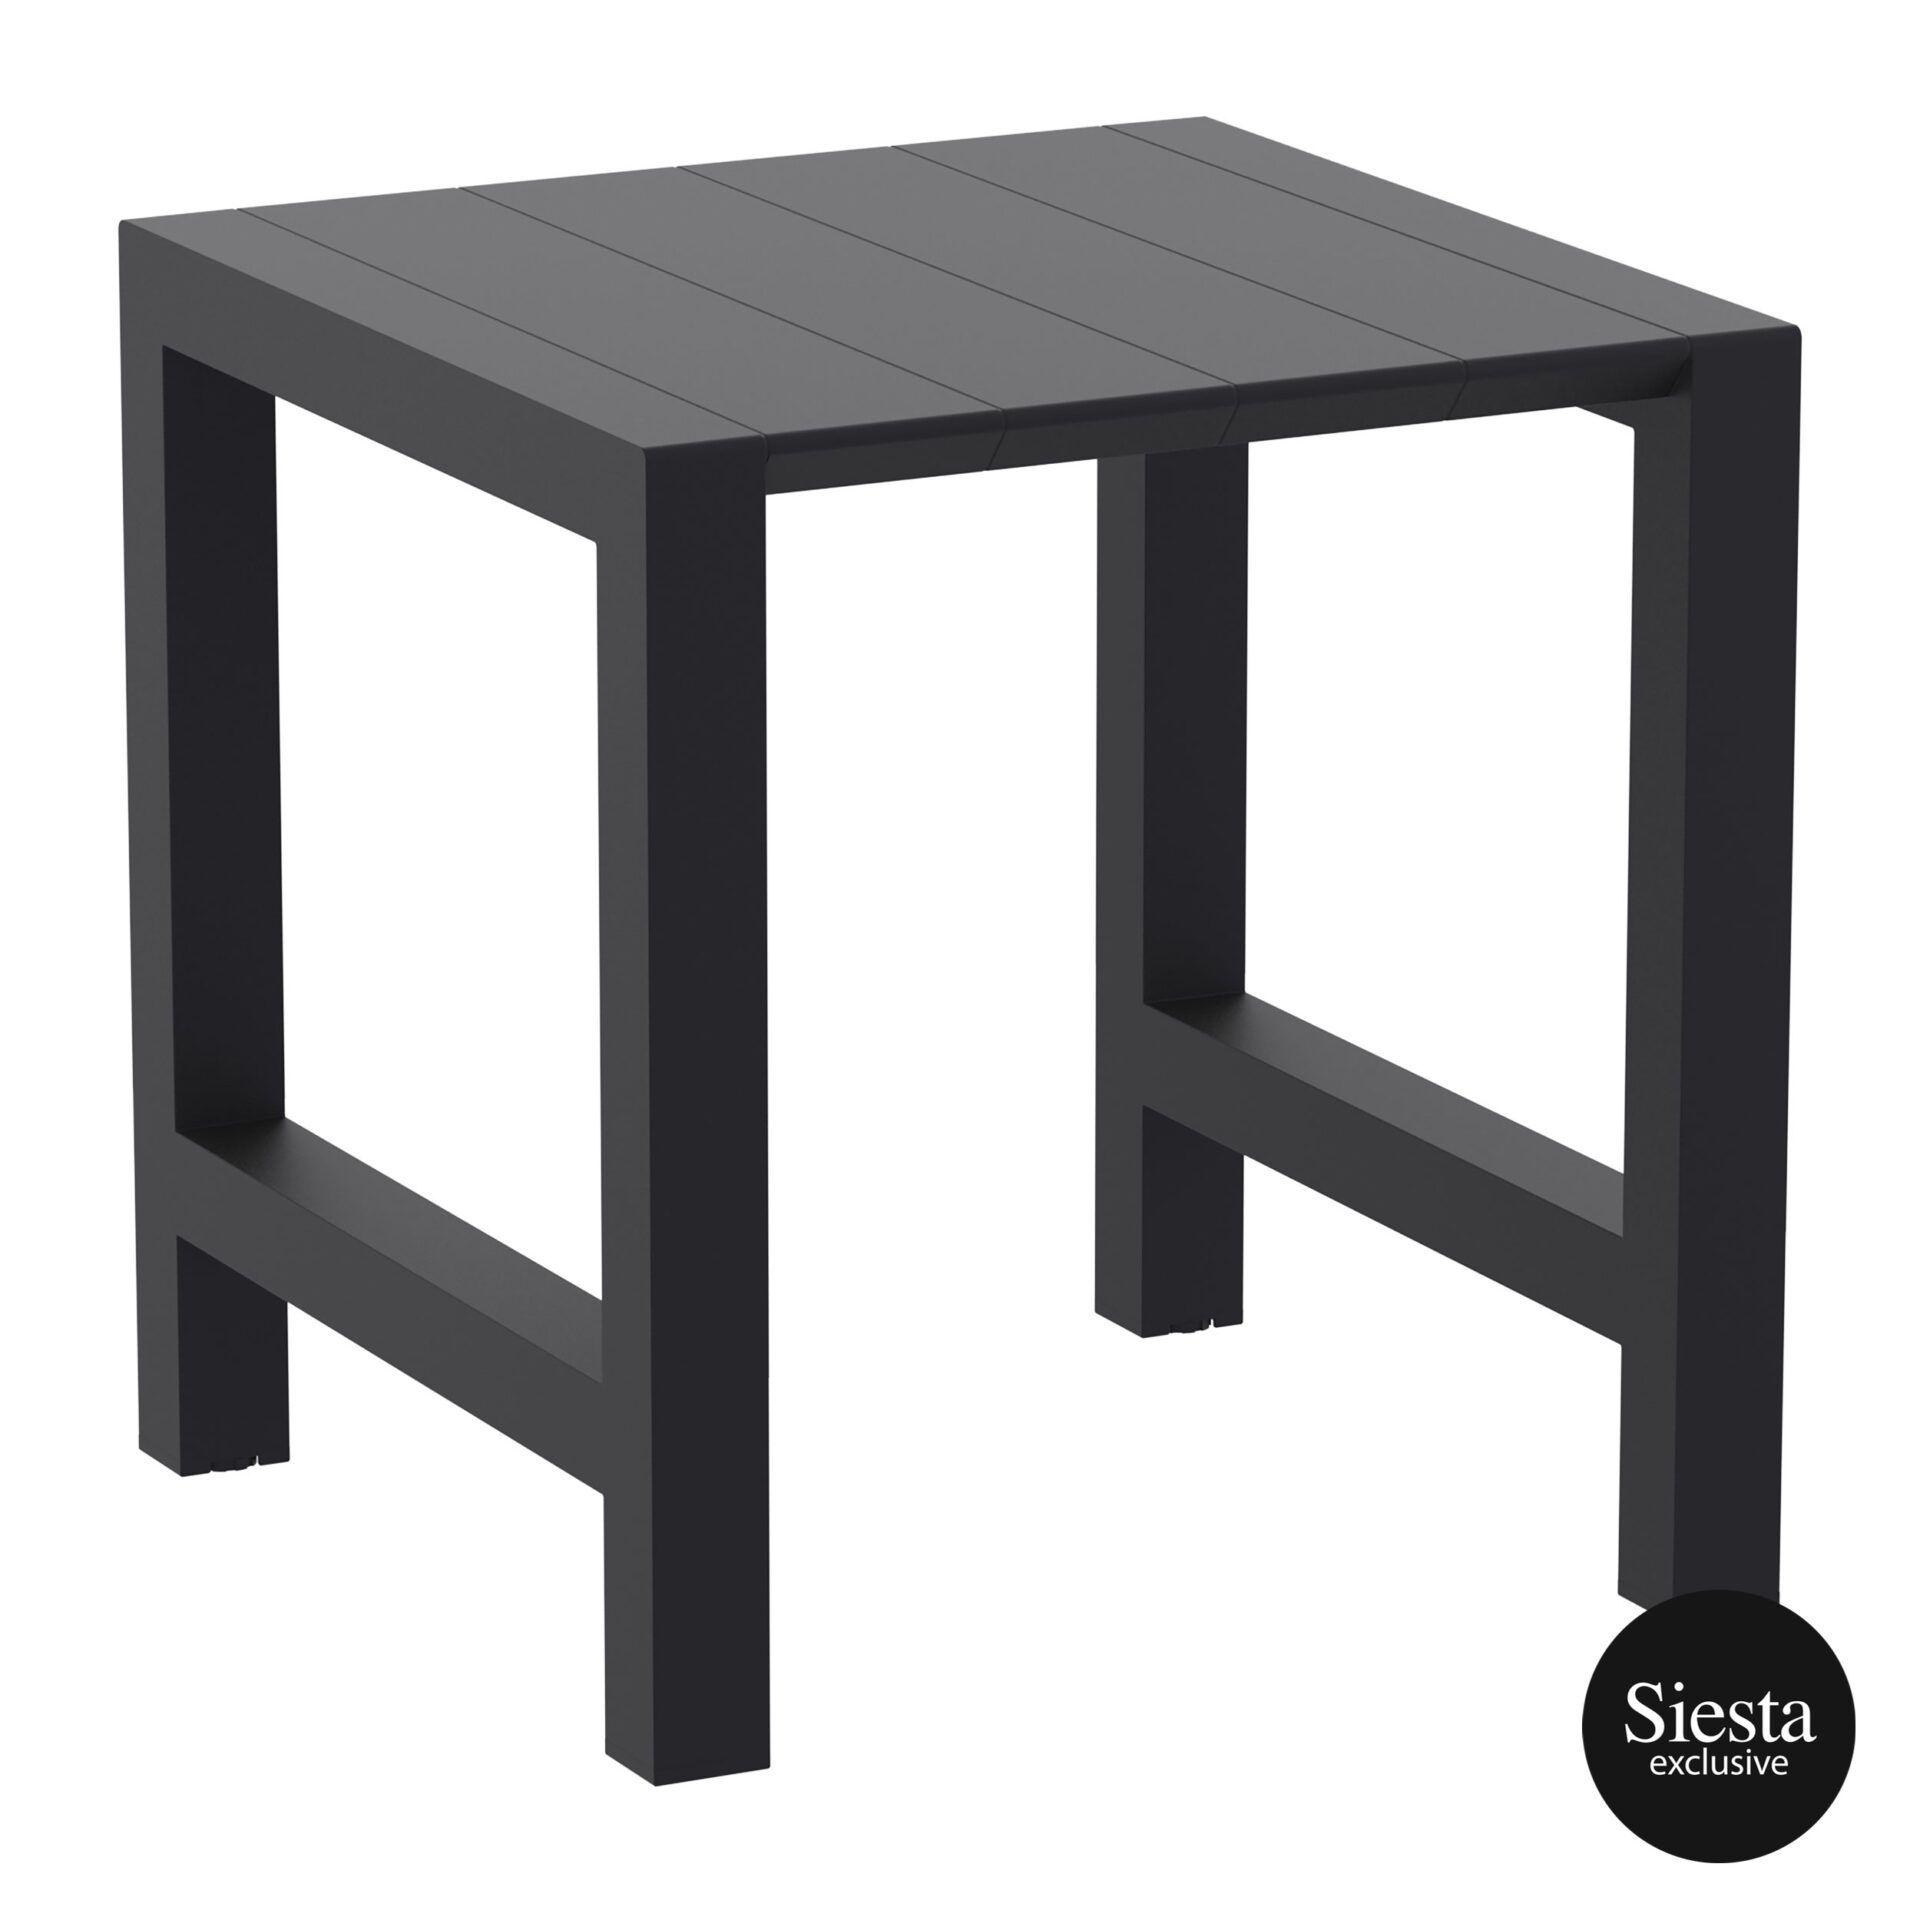 002 vegas bar table 100 black front side